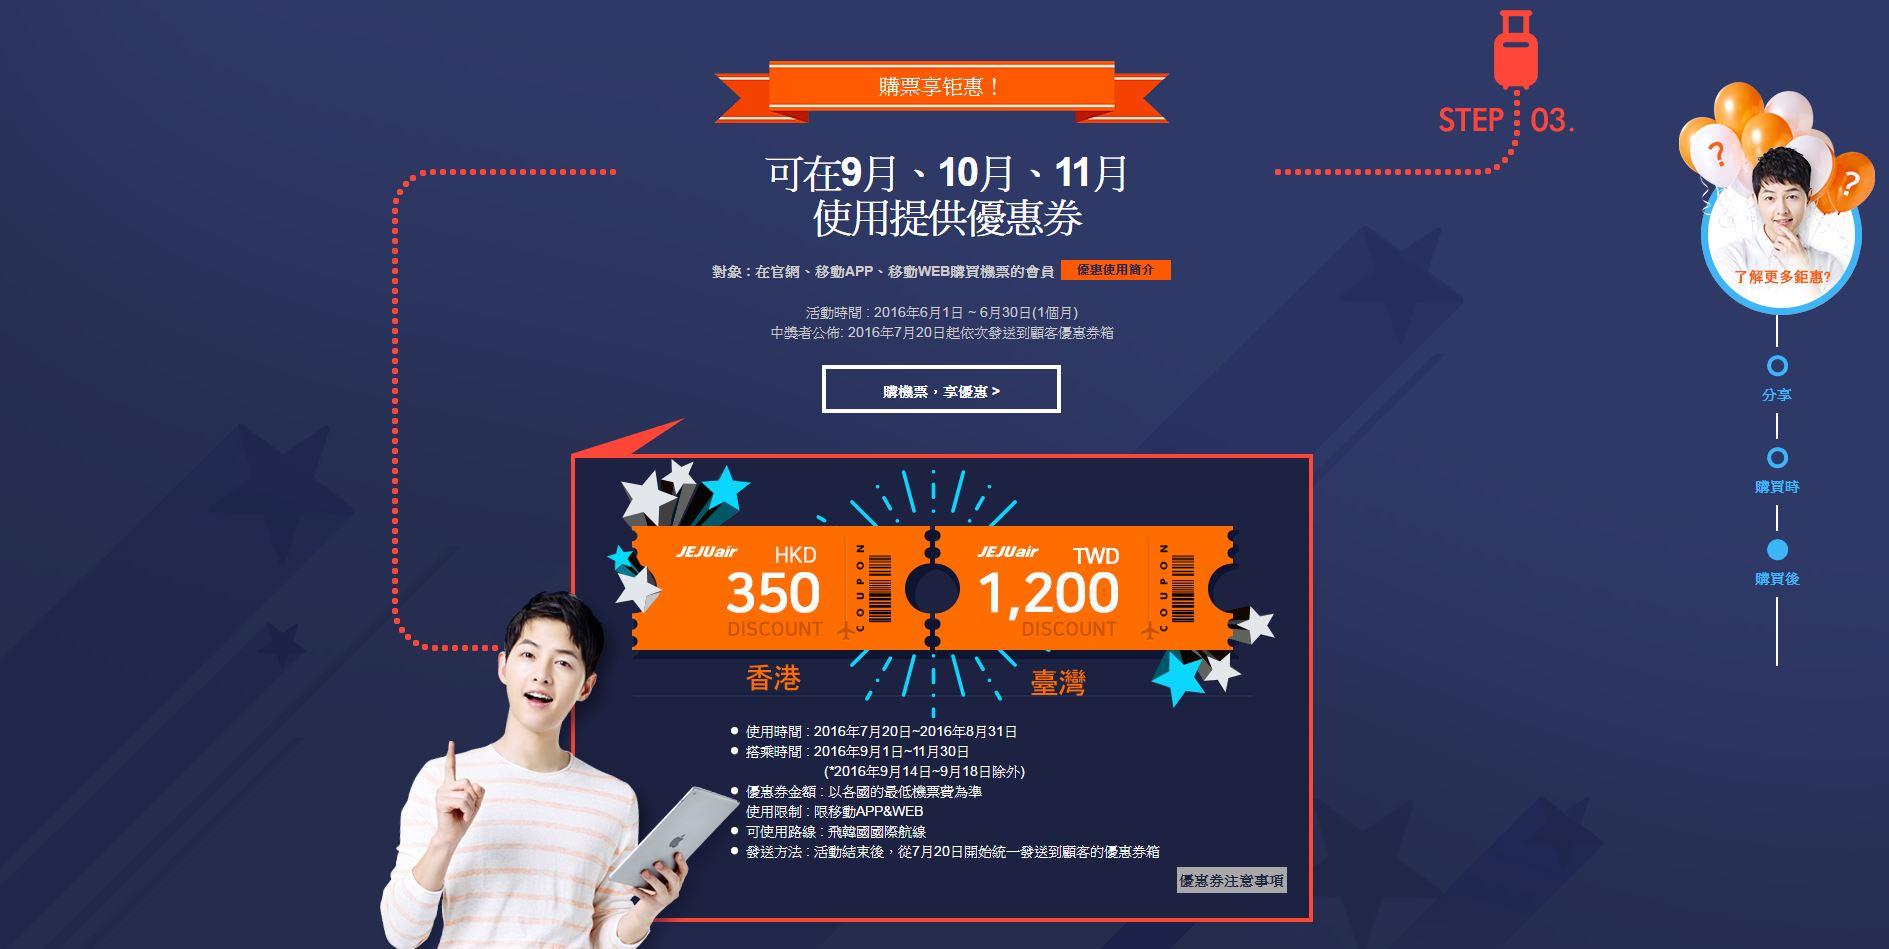 jeju-air-pick-me-up-sales-air-cheap-ticket-sale-summer-campaign-korea-travel (4)